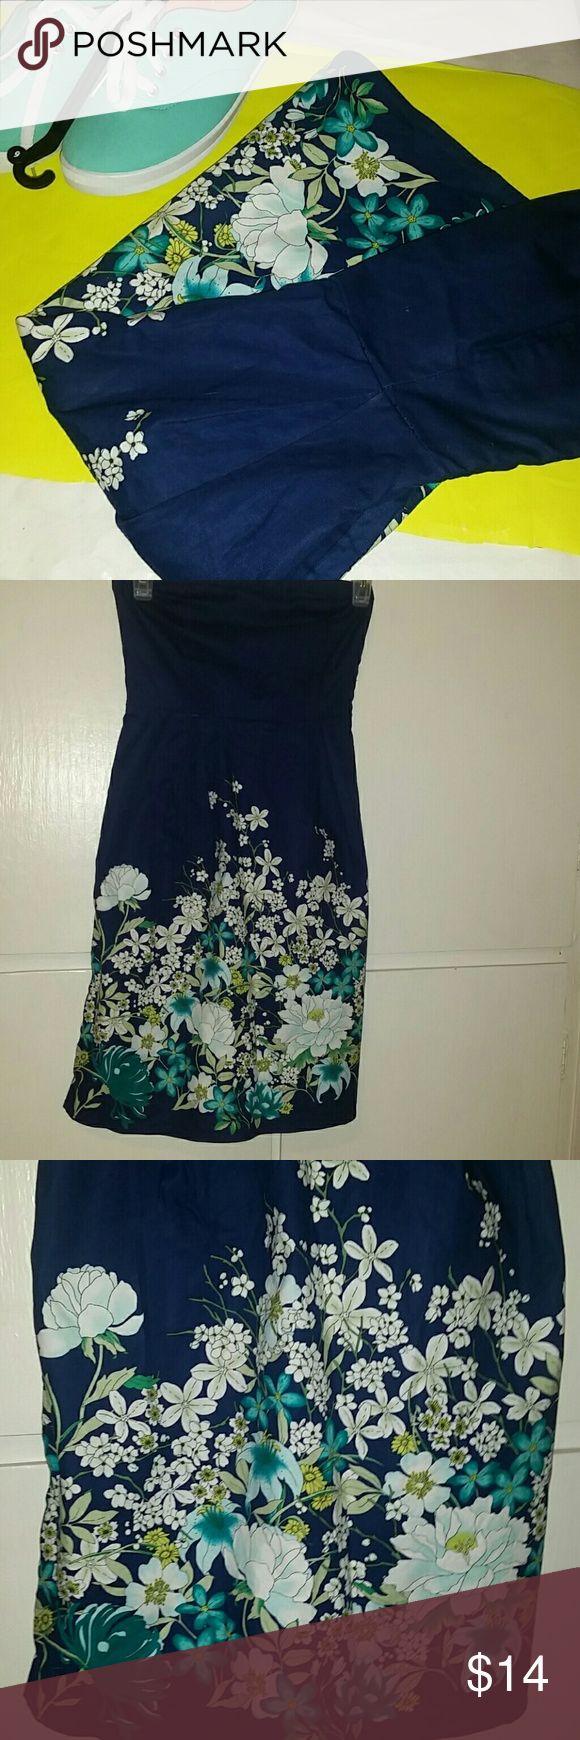 Old Navy strapless sundress Old Navy strapless sundress 97% cotton 3% spandex Old Navy Dresses Strapless